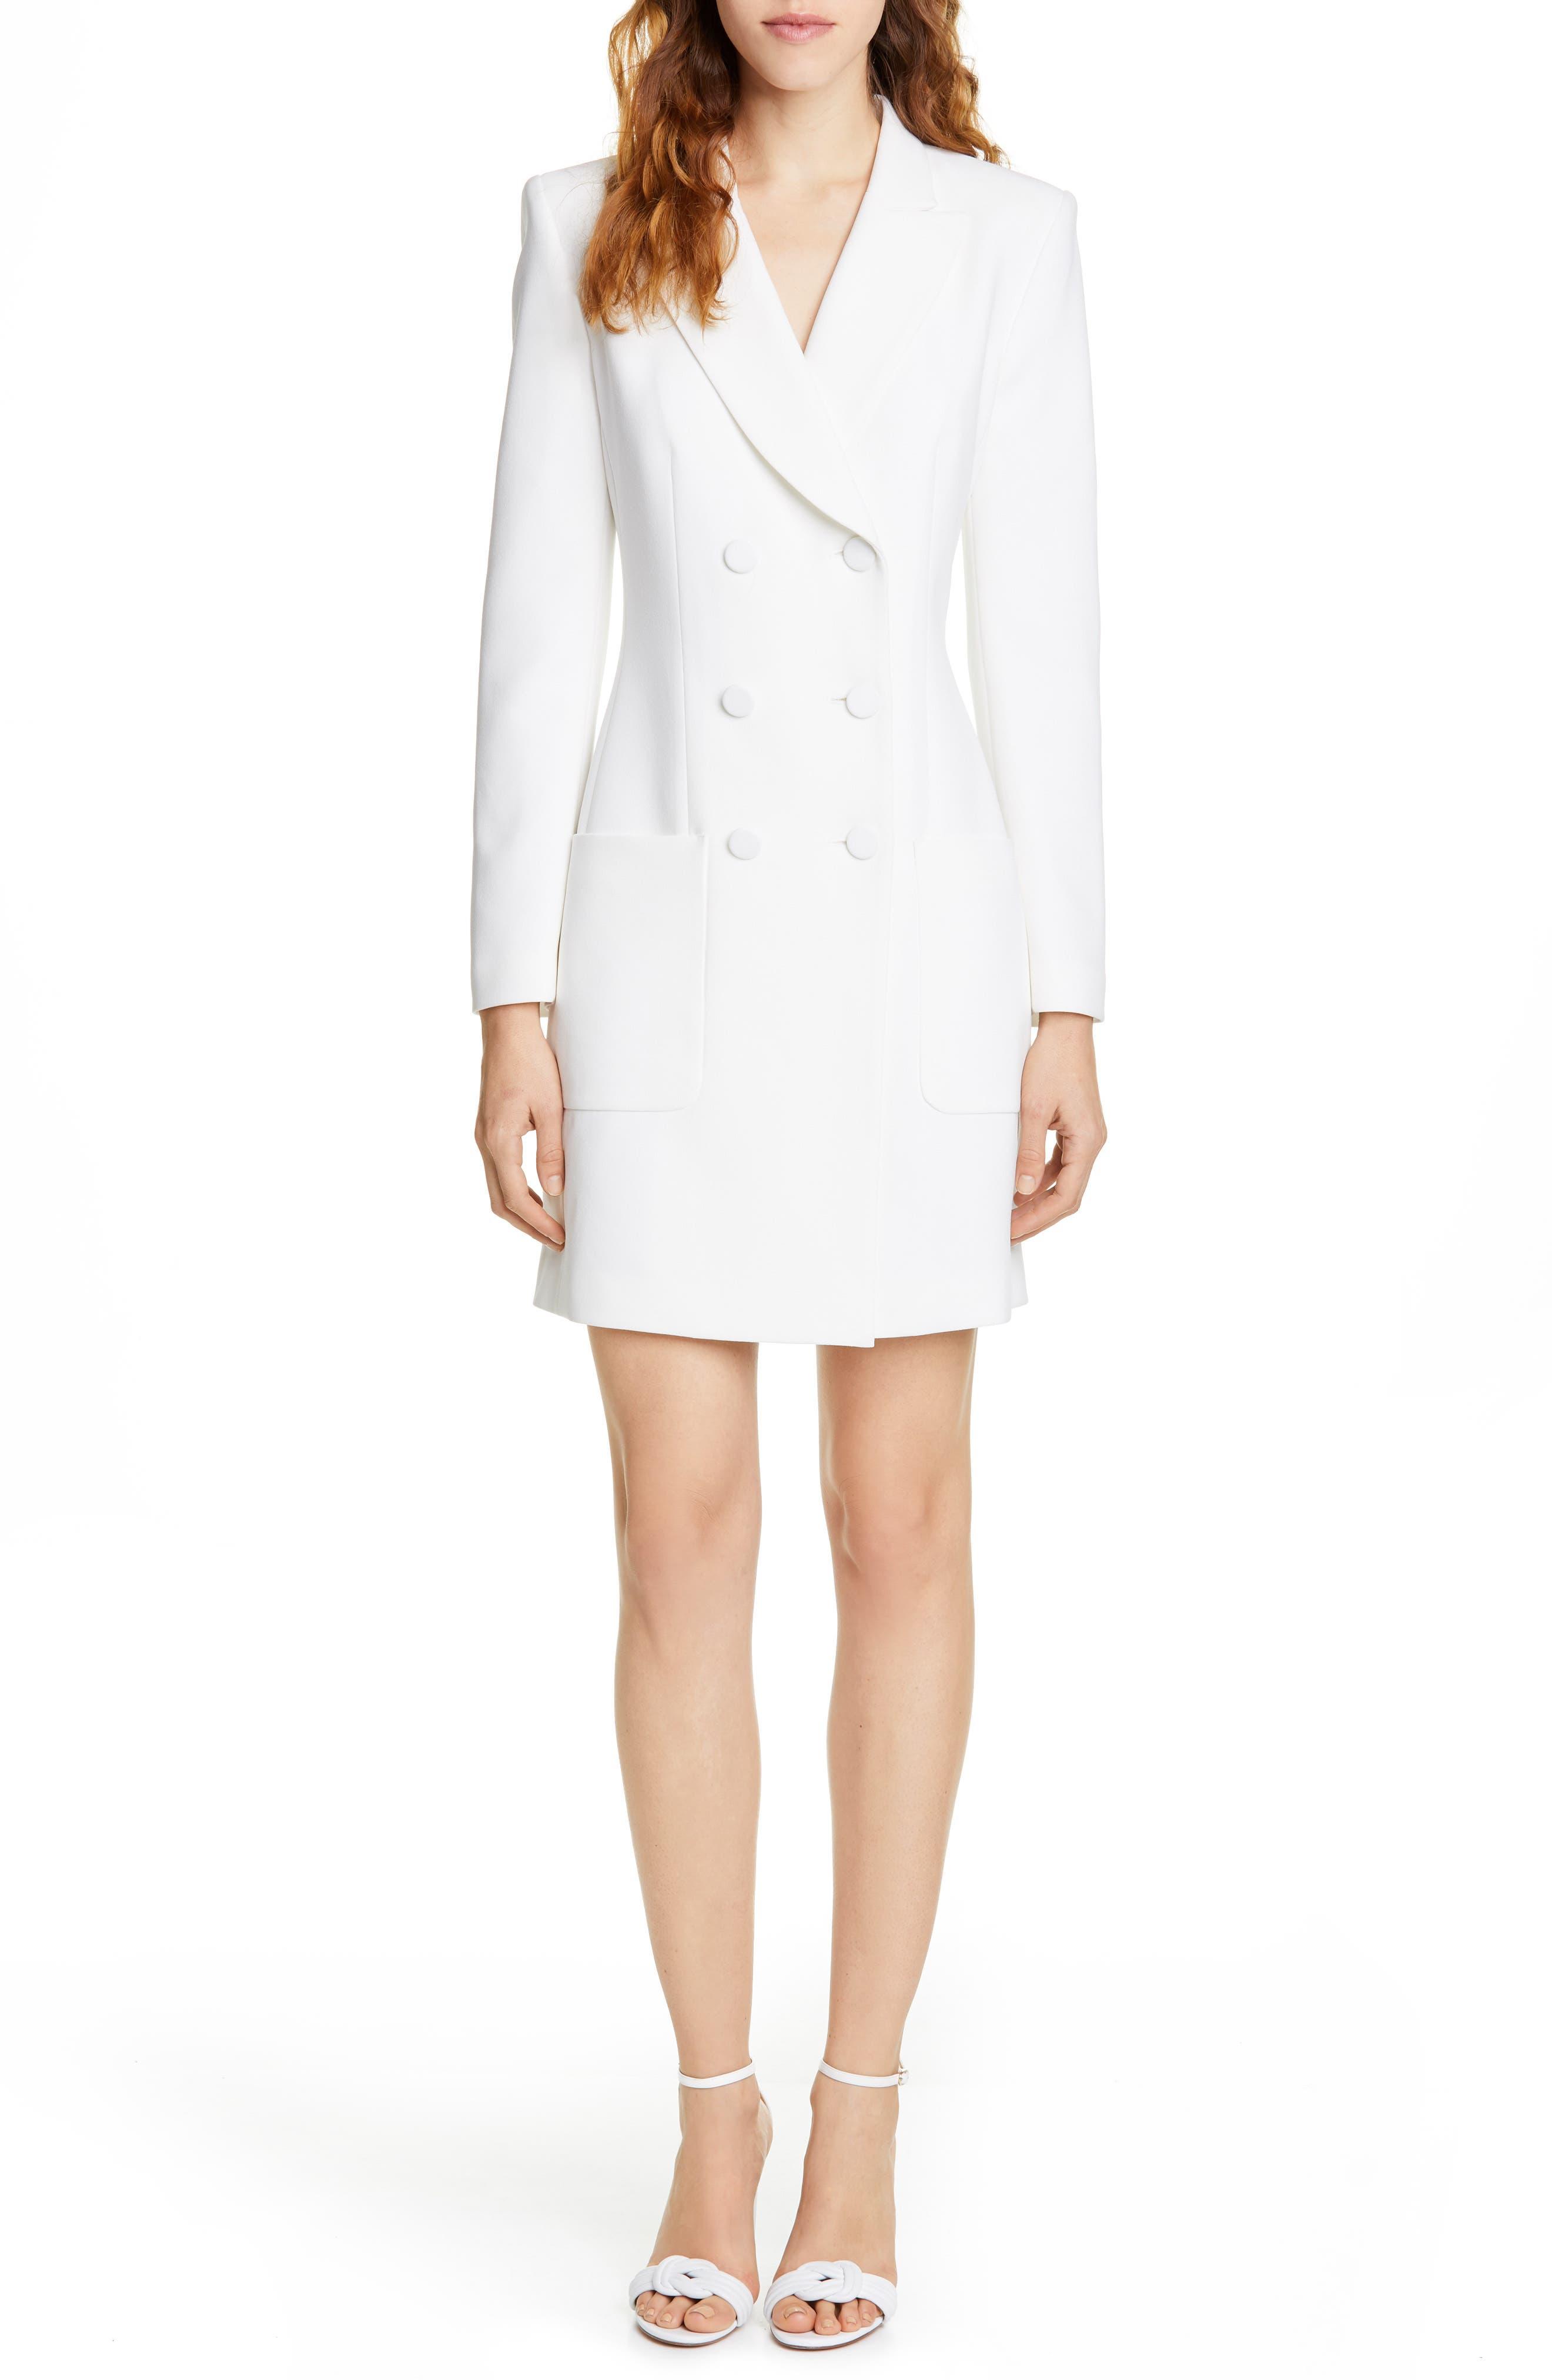 Judith & Charles Digital Double Breasted Blazer Dress, Ivory